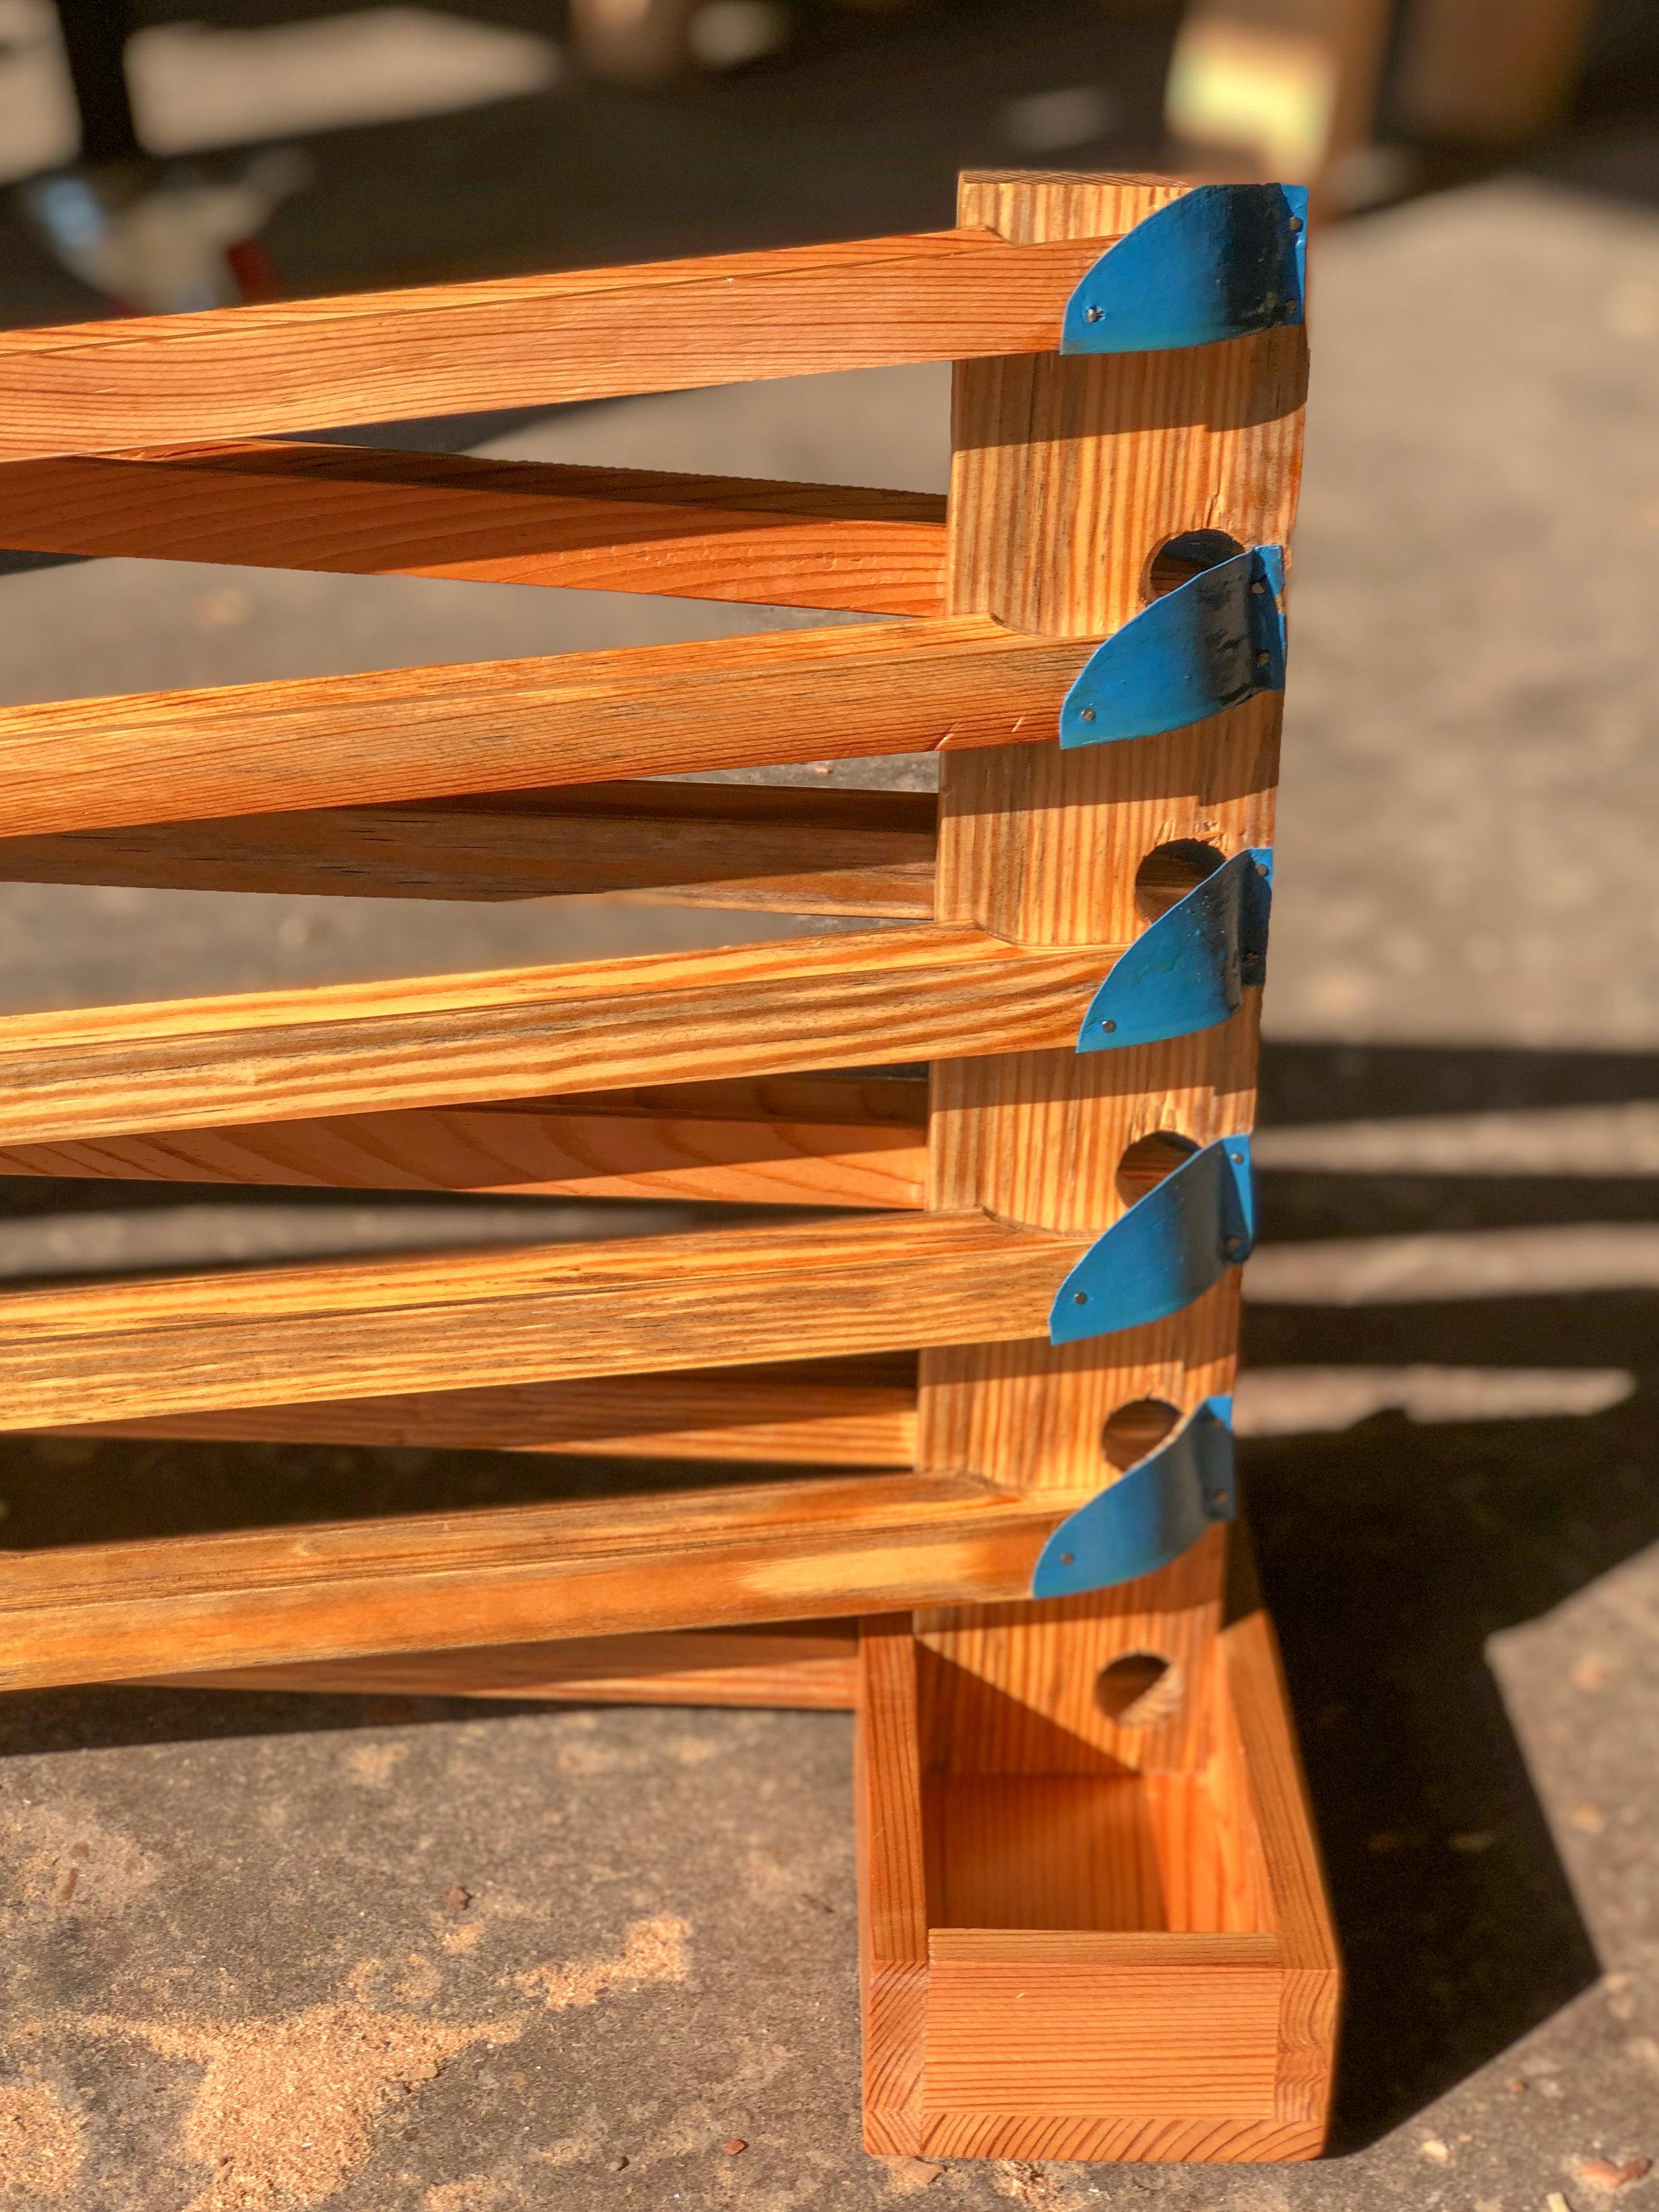 Wooden Marble Run. Handmade Wooden Toys from Richmond, Virginia. Sallie Plumley Studio